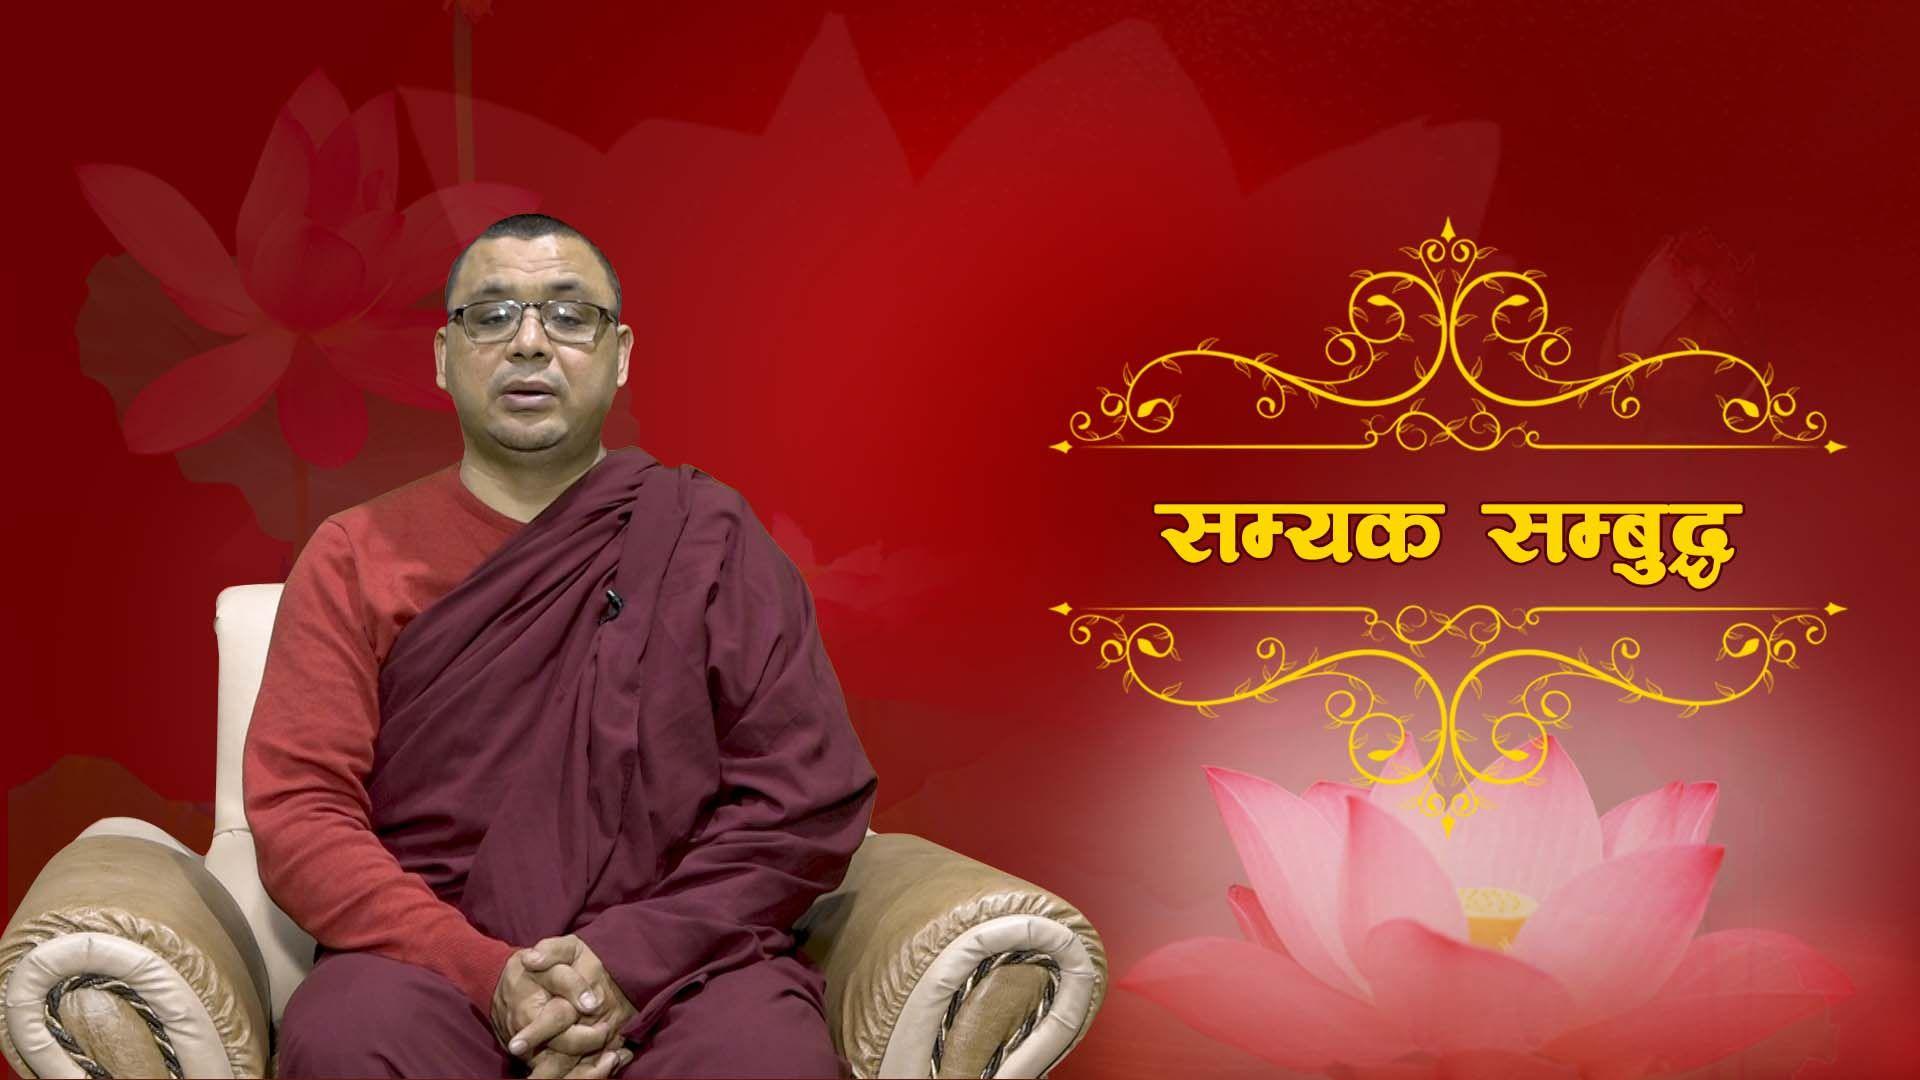 Samyak Sambuddha